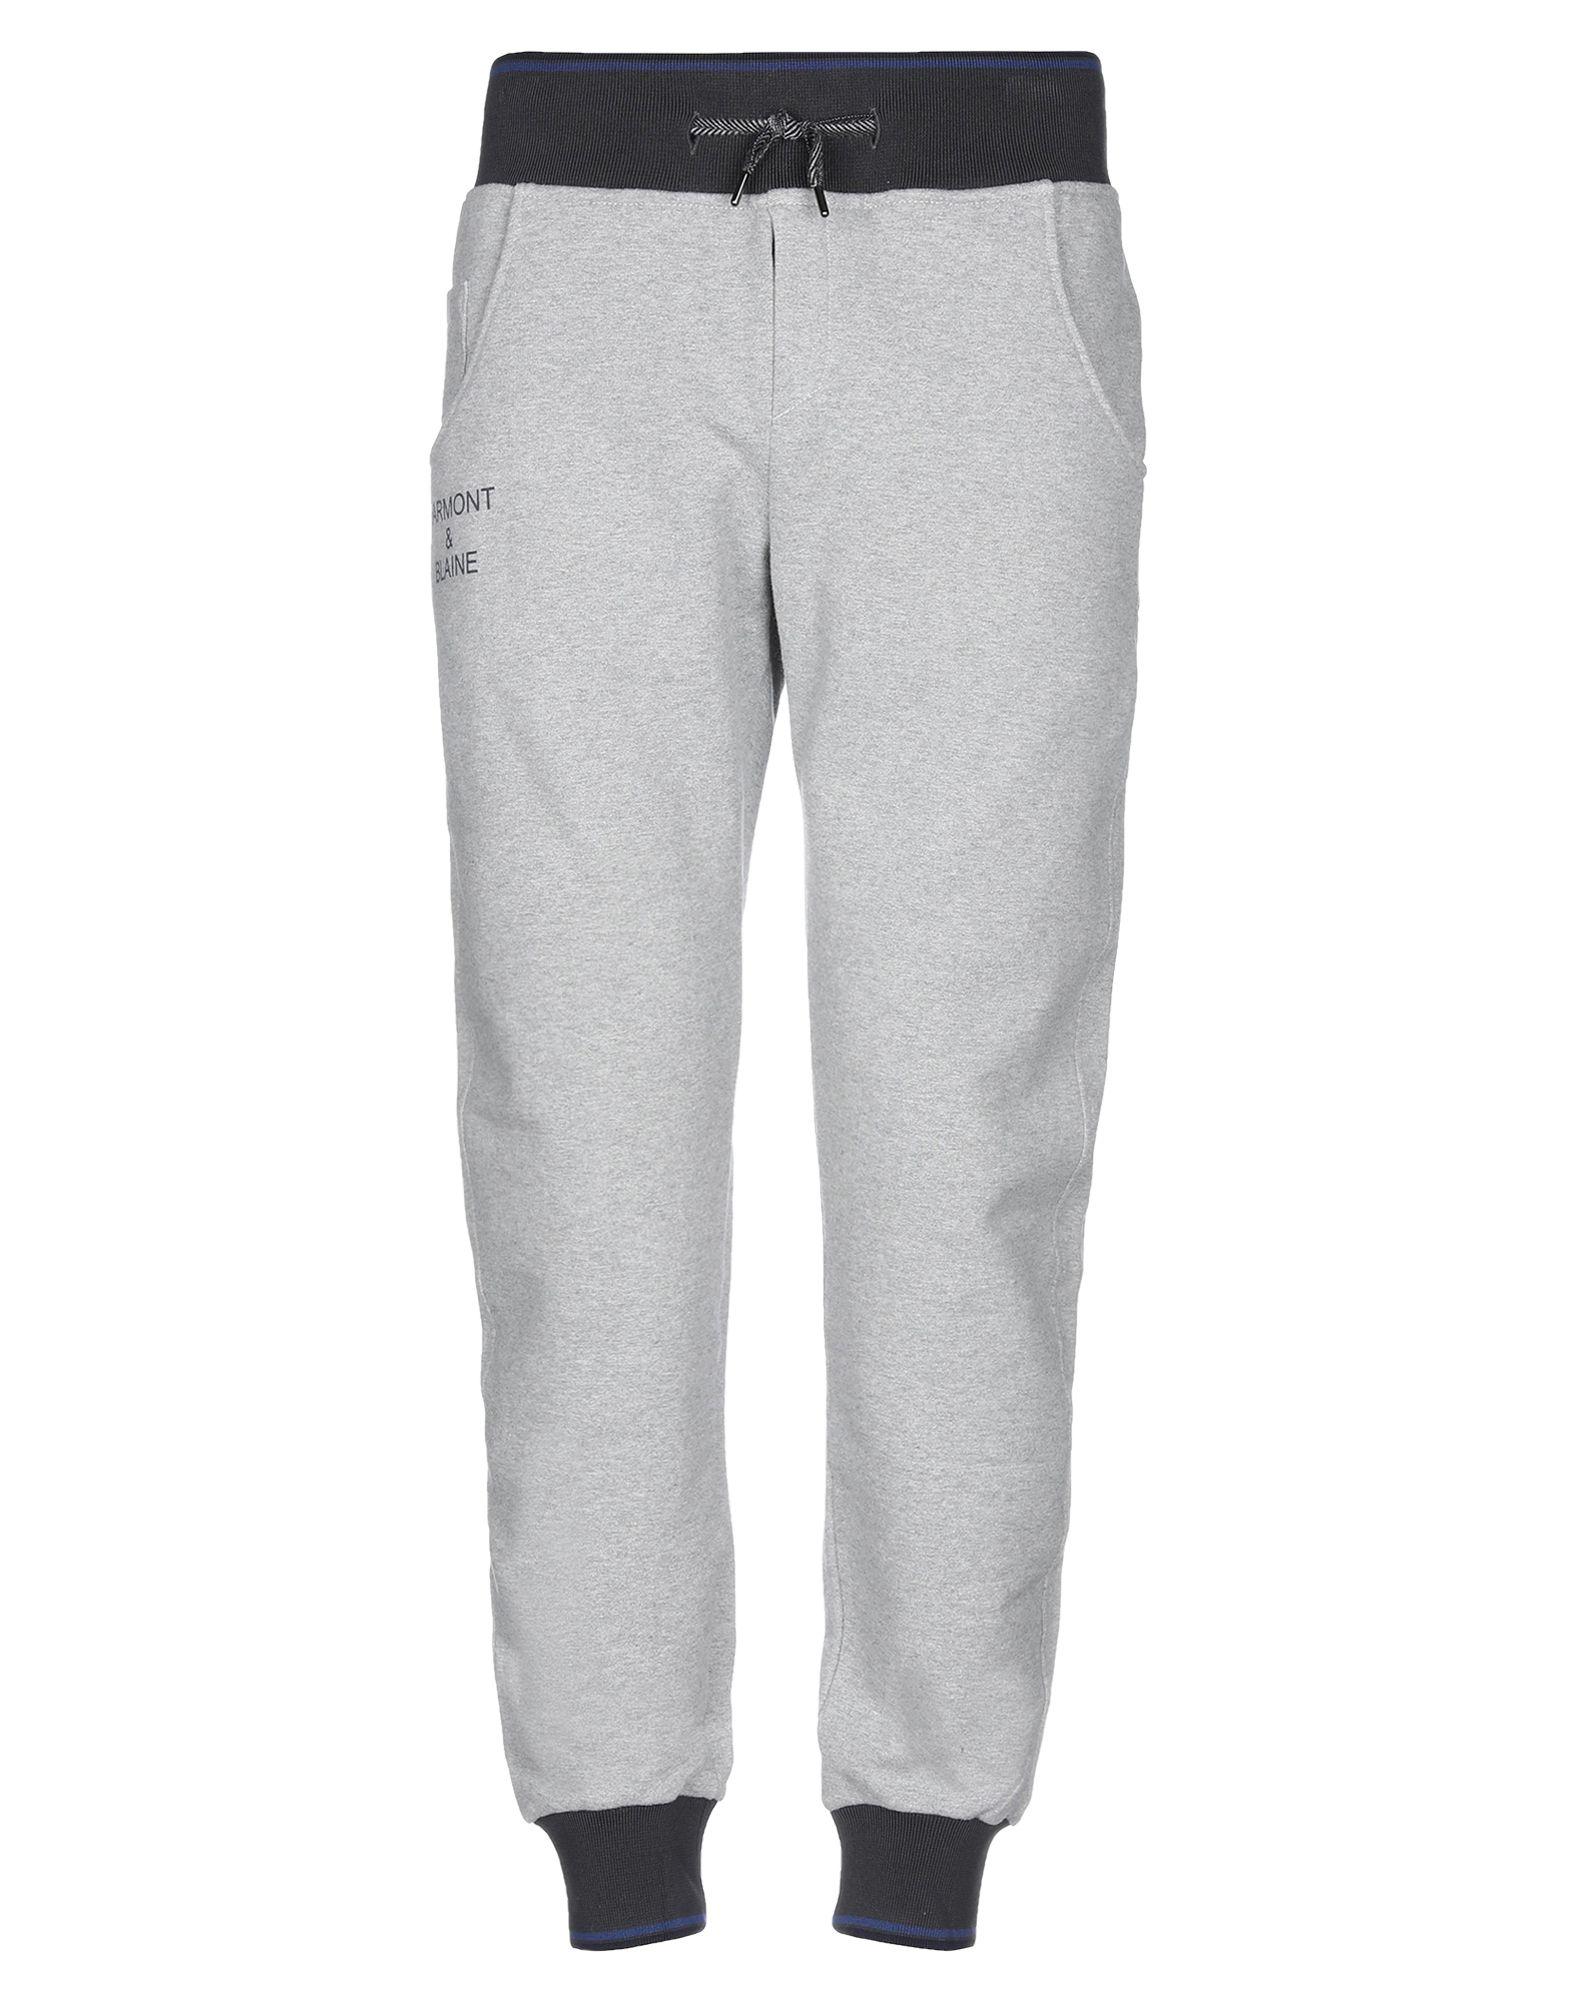 Pantalone Harmont&Blaine uomo - 13375792EC